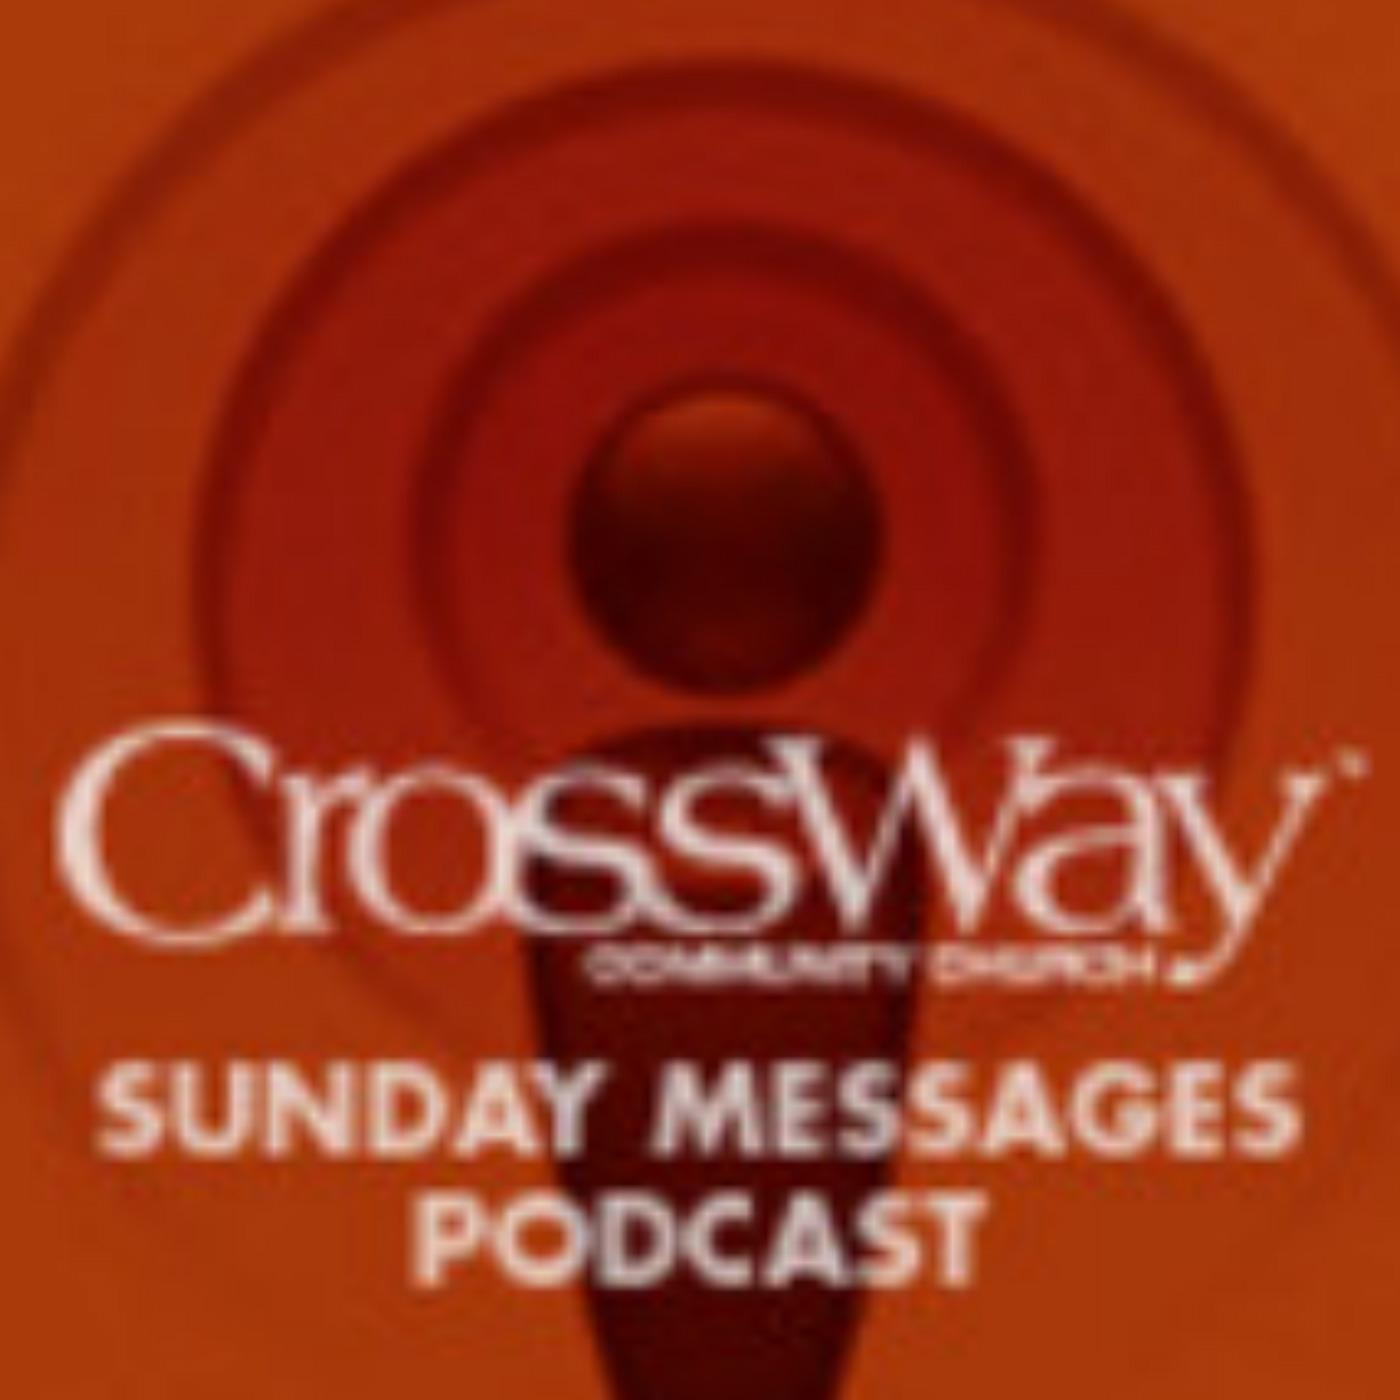 CrossWay Community Podcast